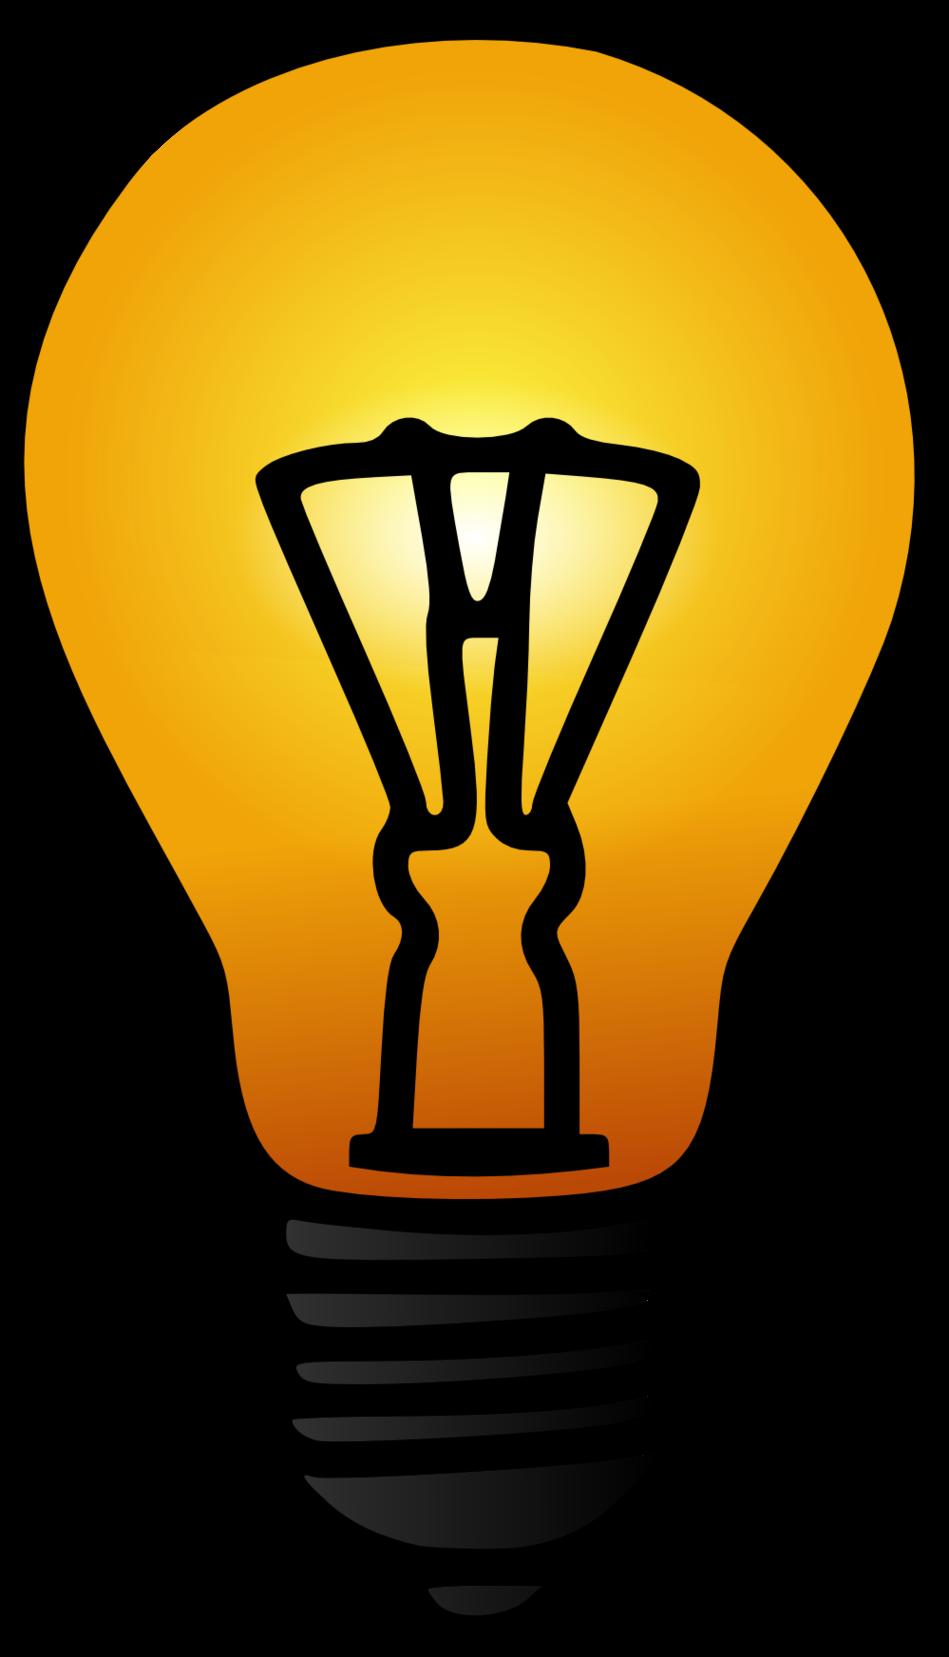 Electric bulbs clipground light. Lamp clipart radiant energy